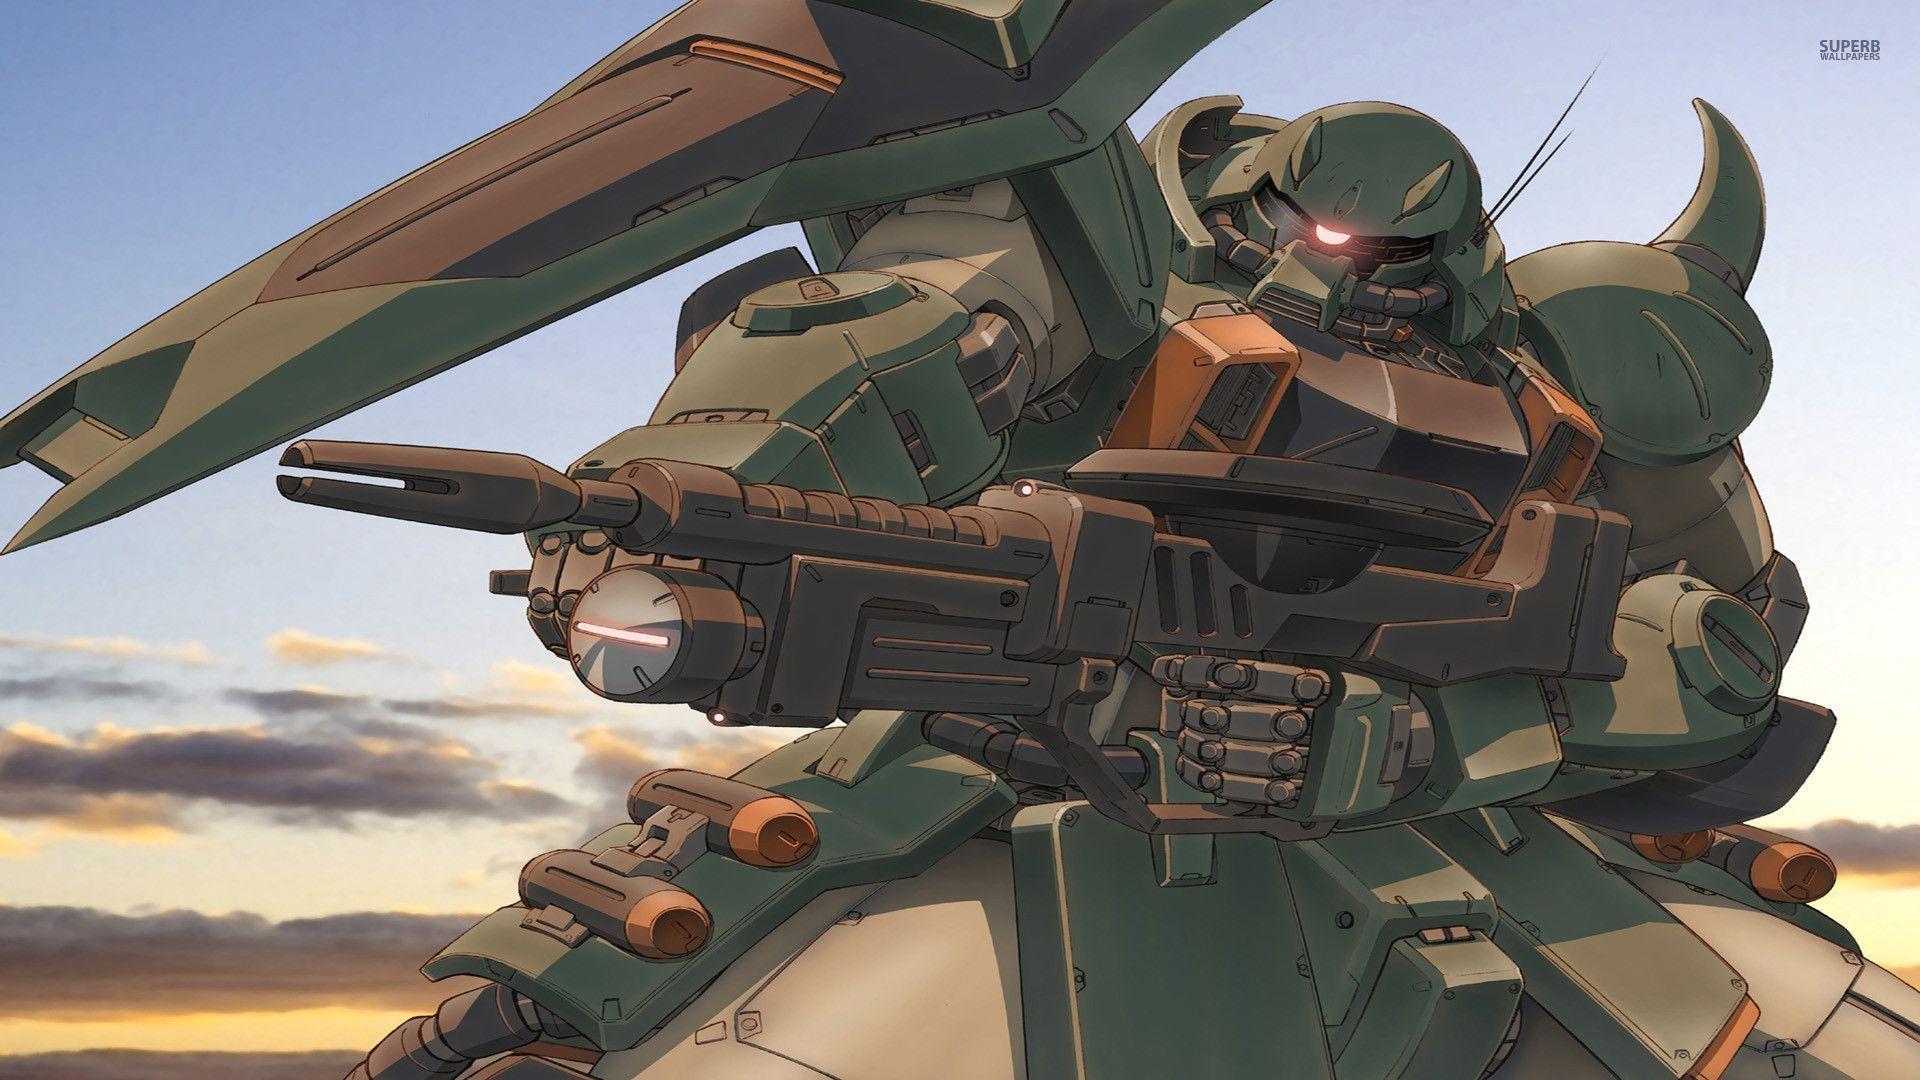 mobile suit gundam 0079 wallpaper - Google Search | Gundam ...